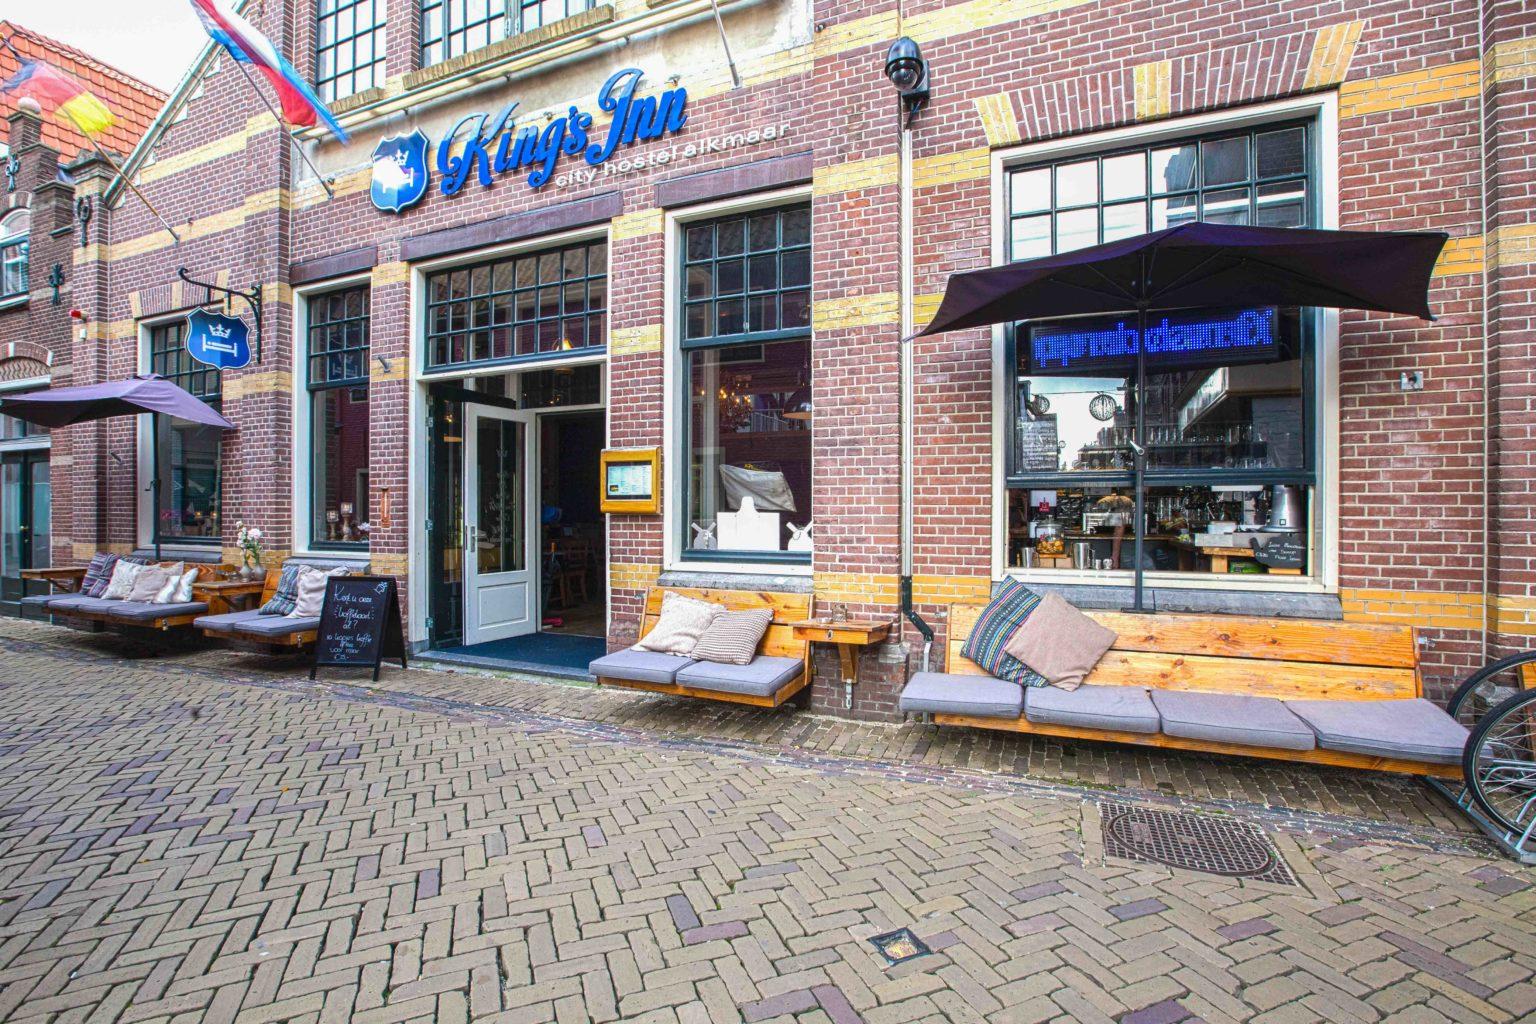 King's Inn City Hotel Alkmaar